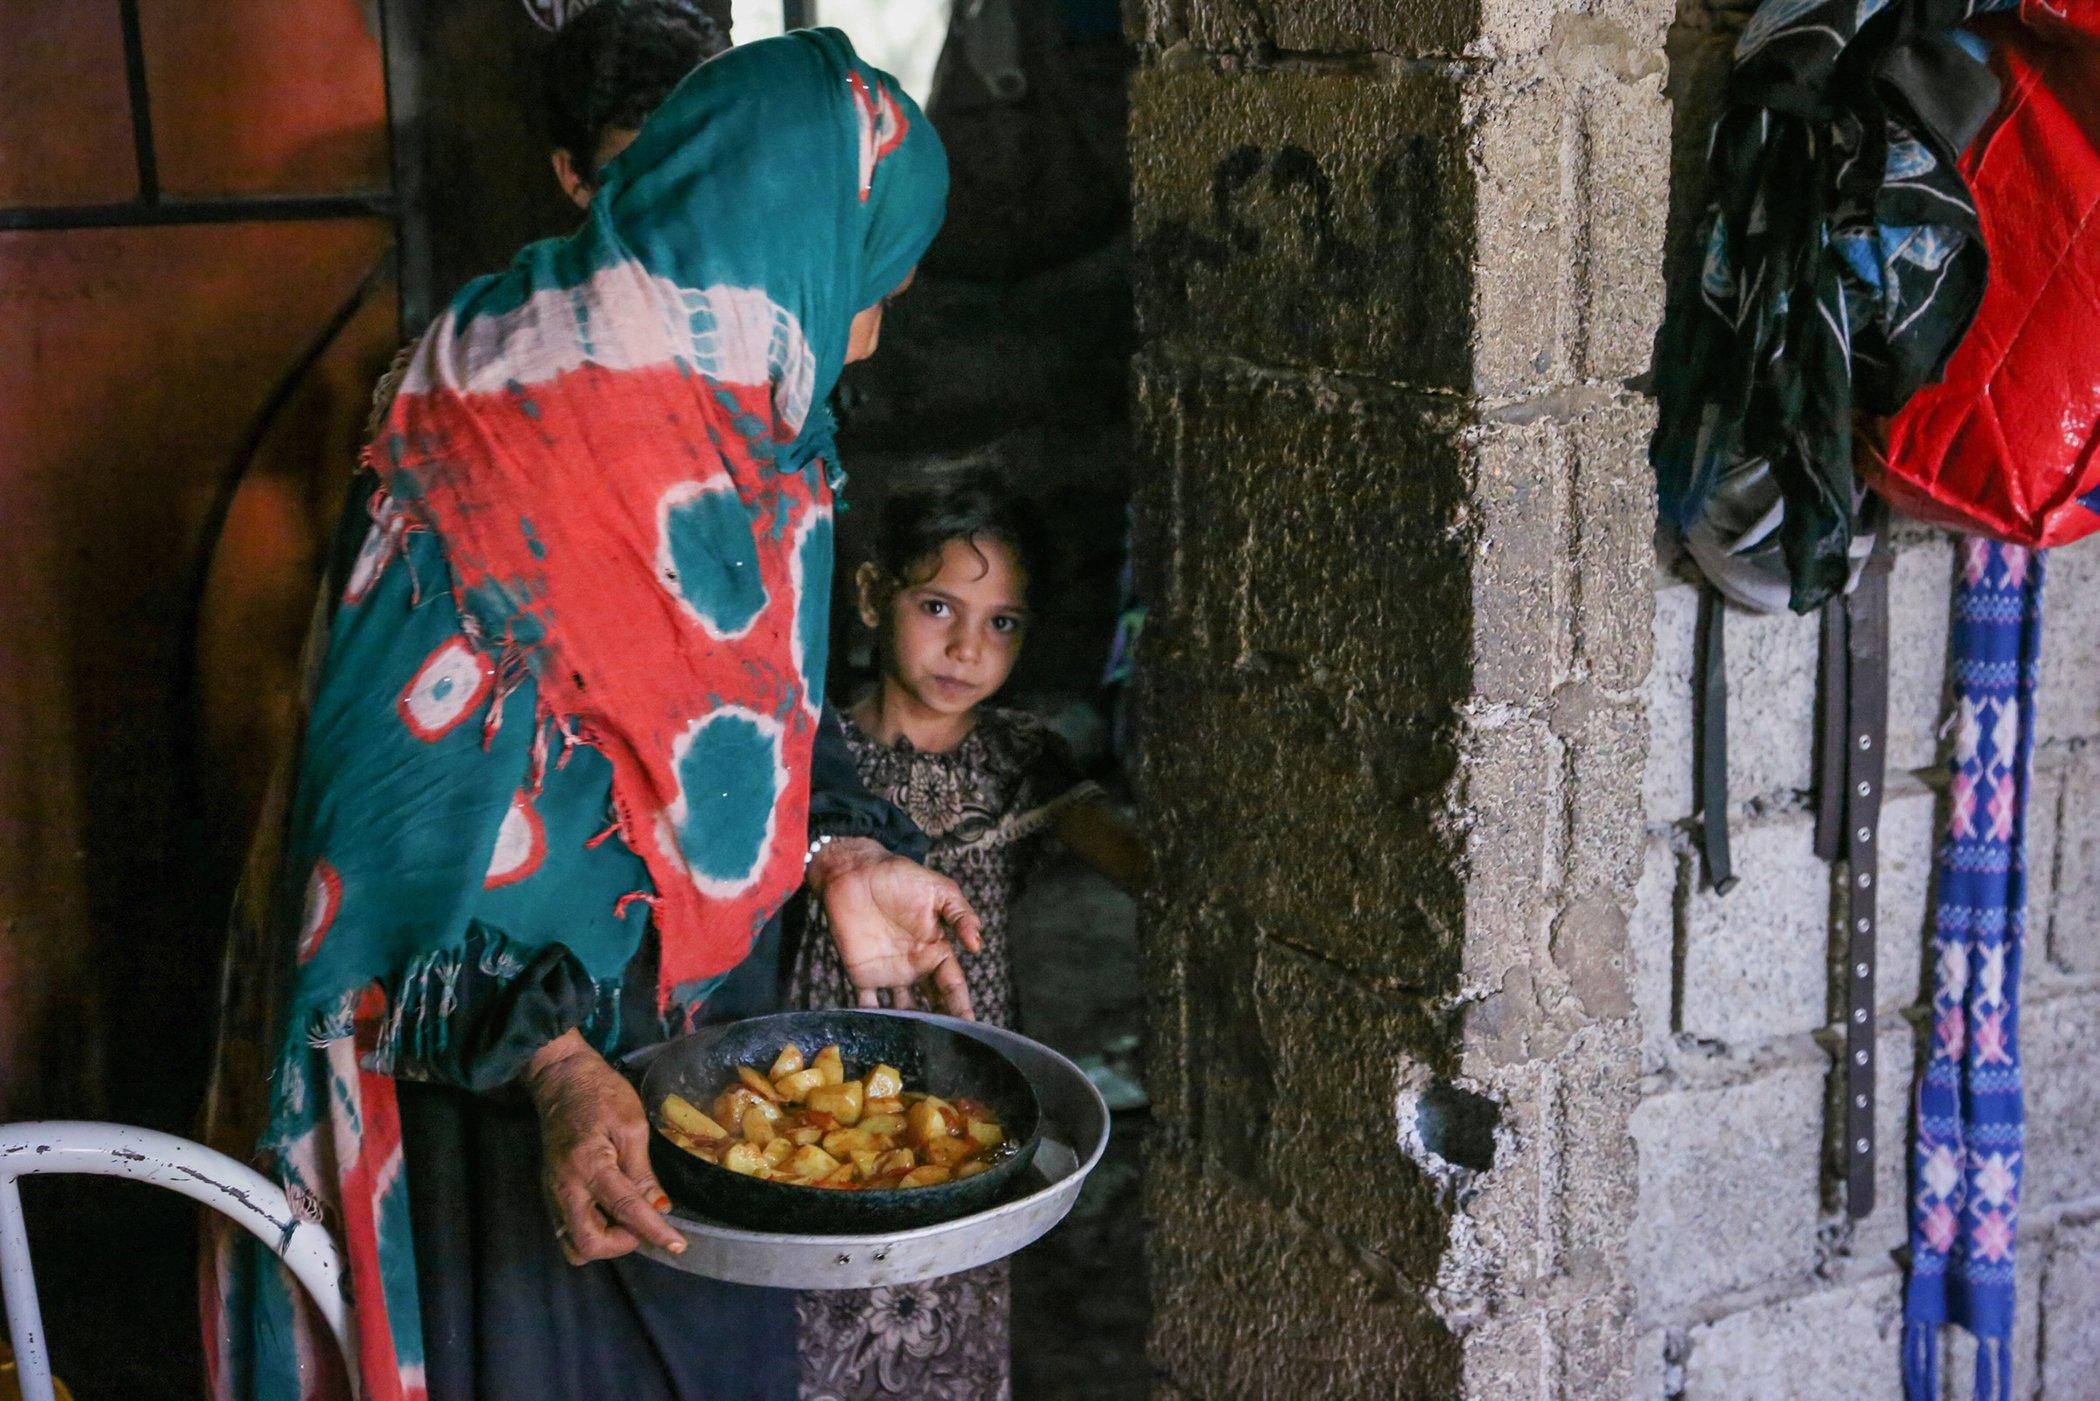 World-Food-Programme-Famine-Philanthropy-Billionares-COVID19-Response-003.JPG